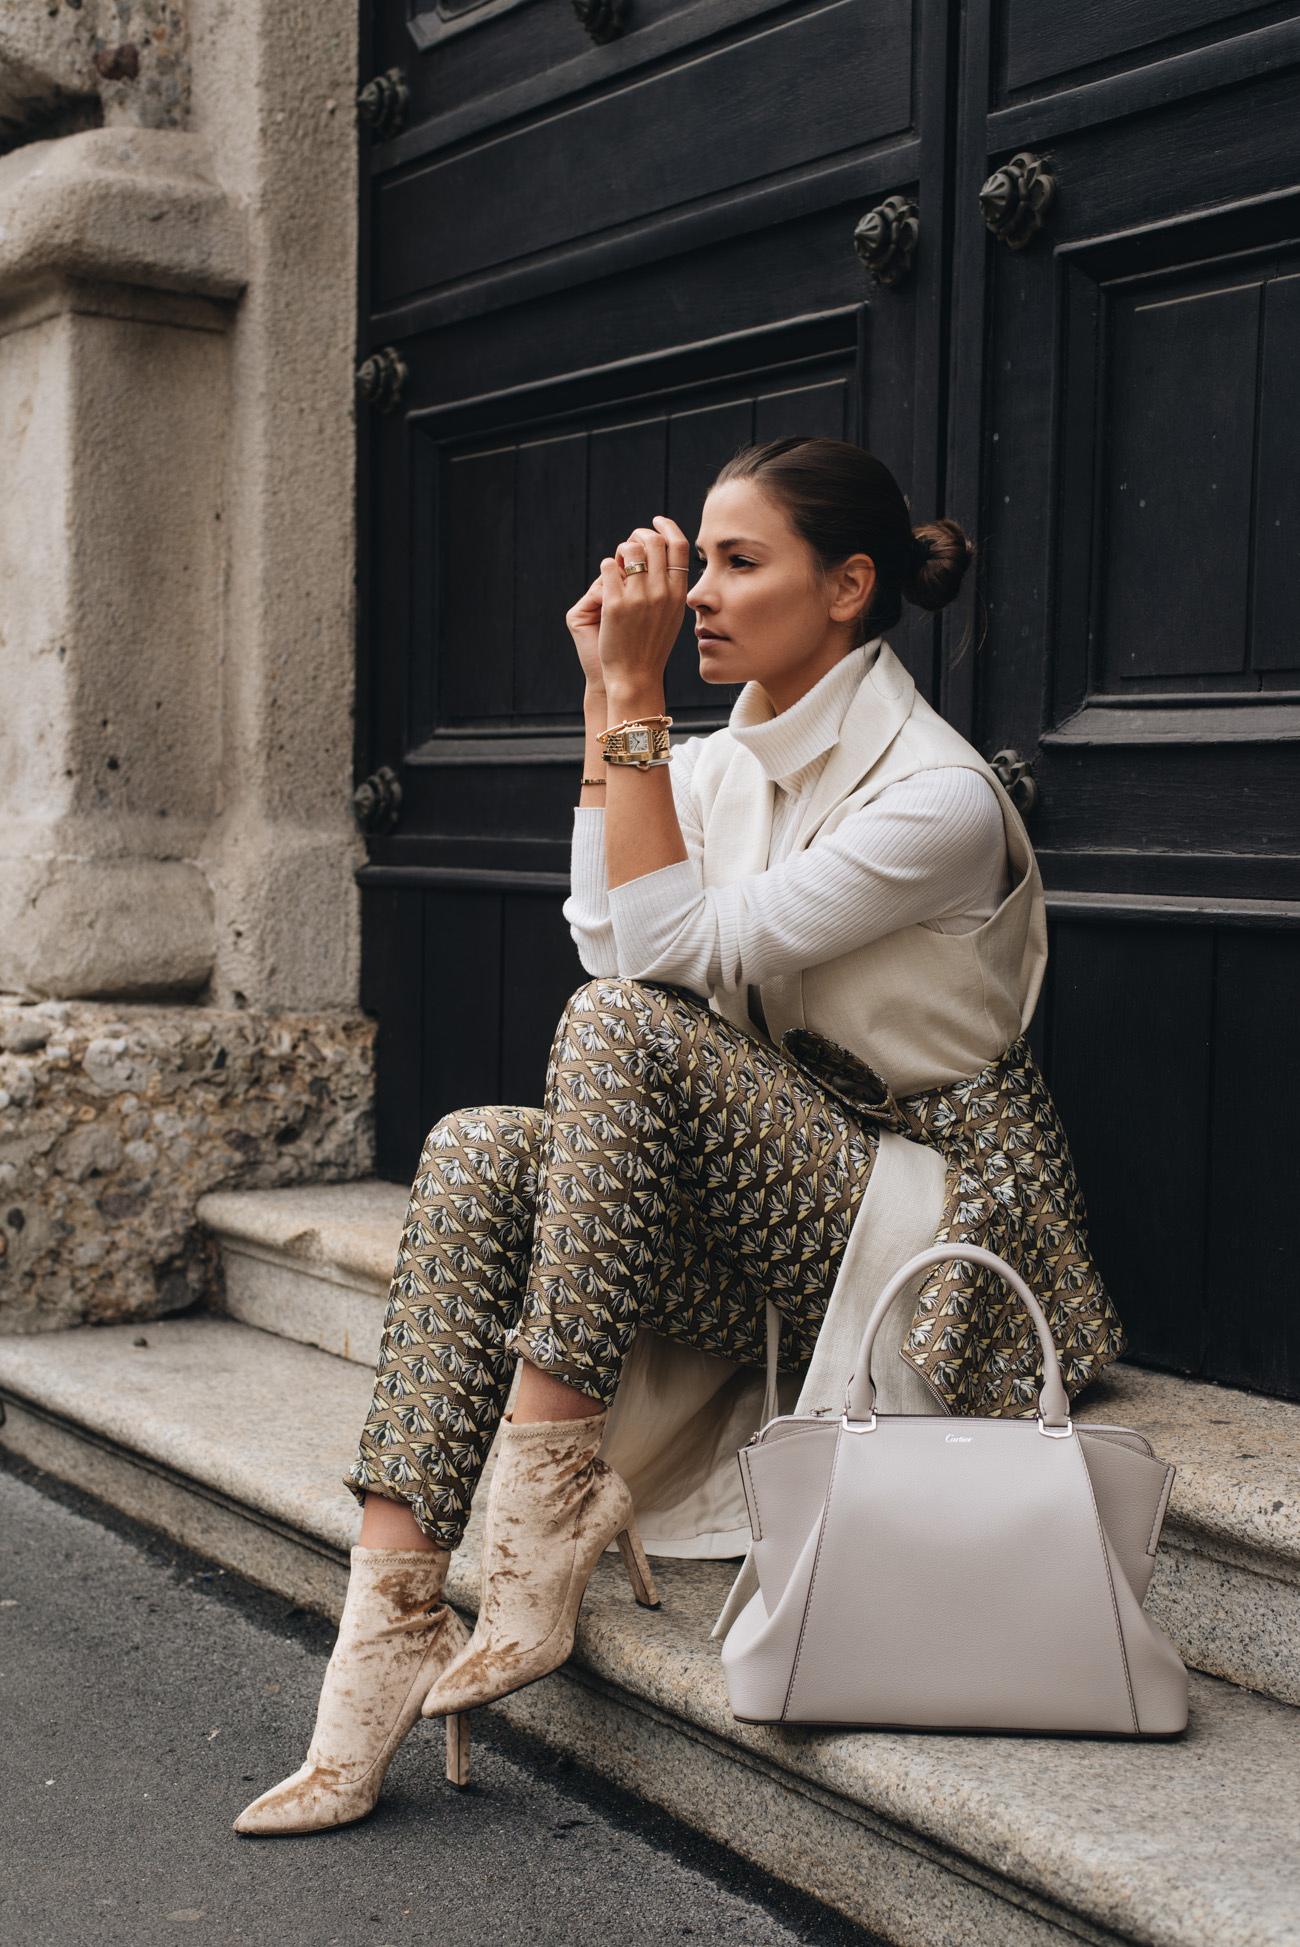 Cartier-Schmuck-Ikonen-Klassiker-Love-Bracelet-SM-Panthere-Uhr-Trinity-Armband-nina-schwichtenberg-fashiioncarpet